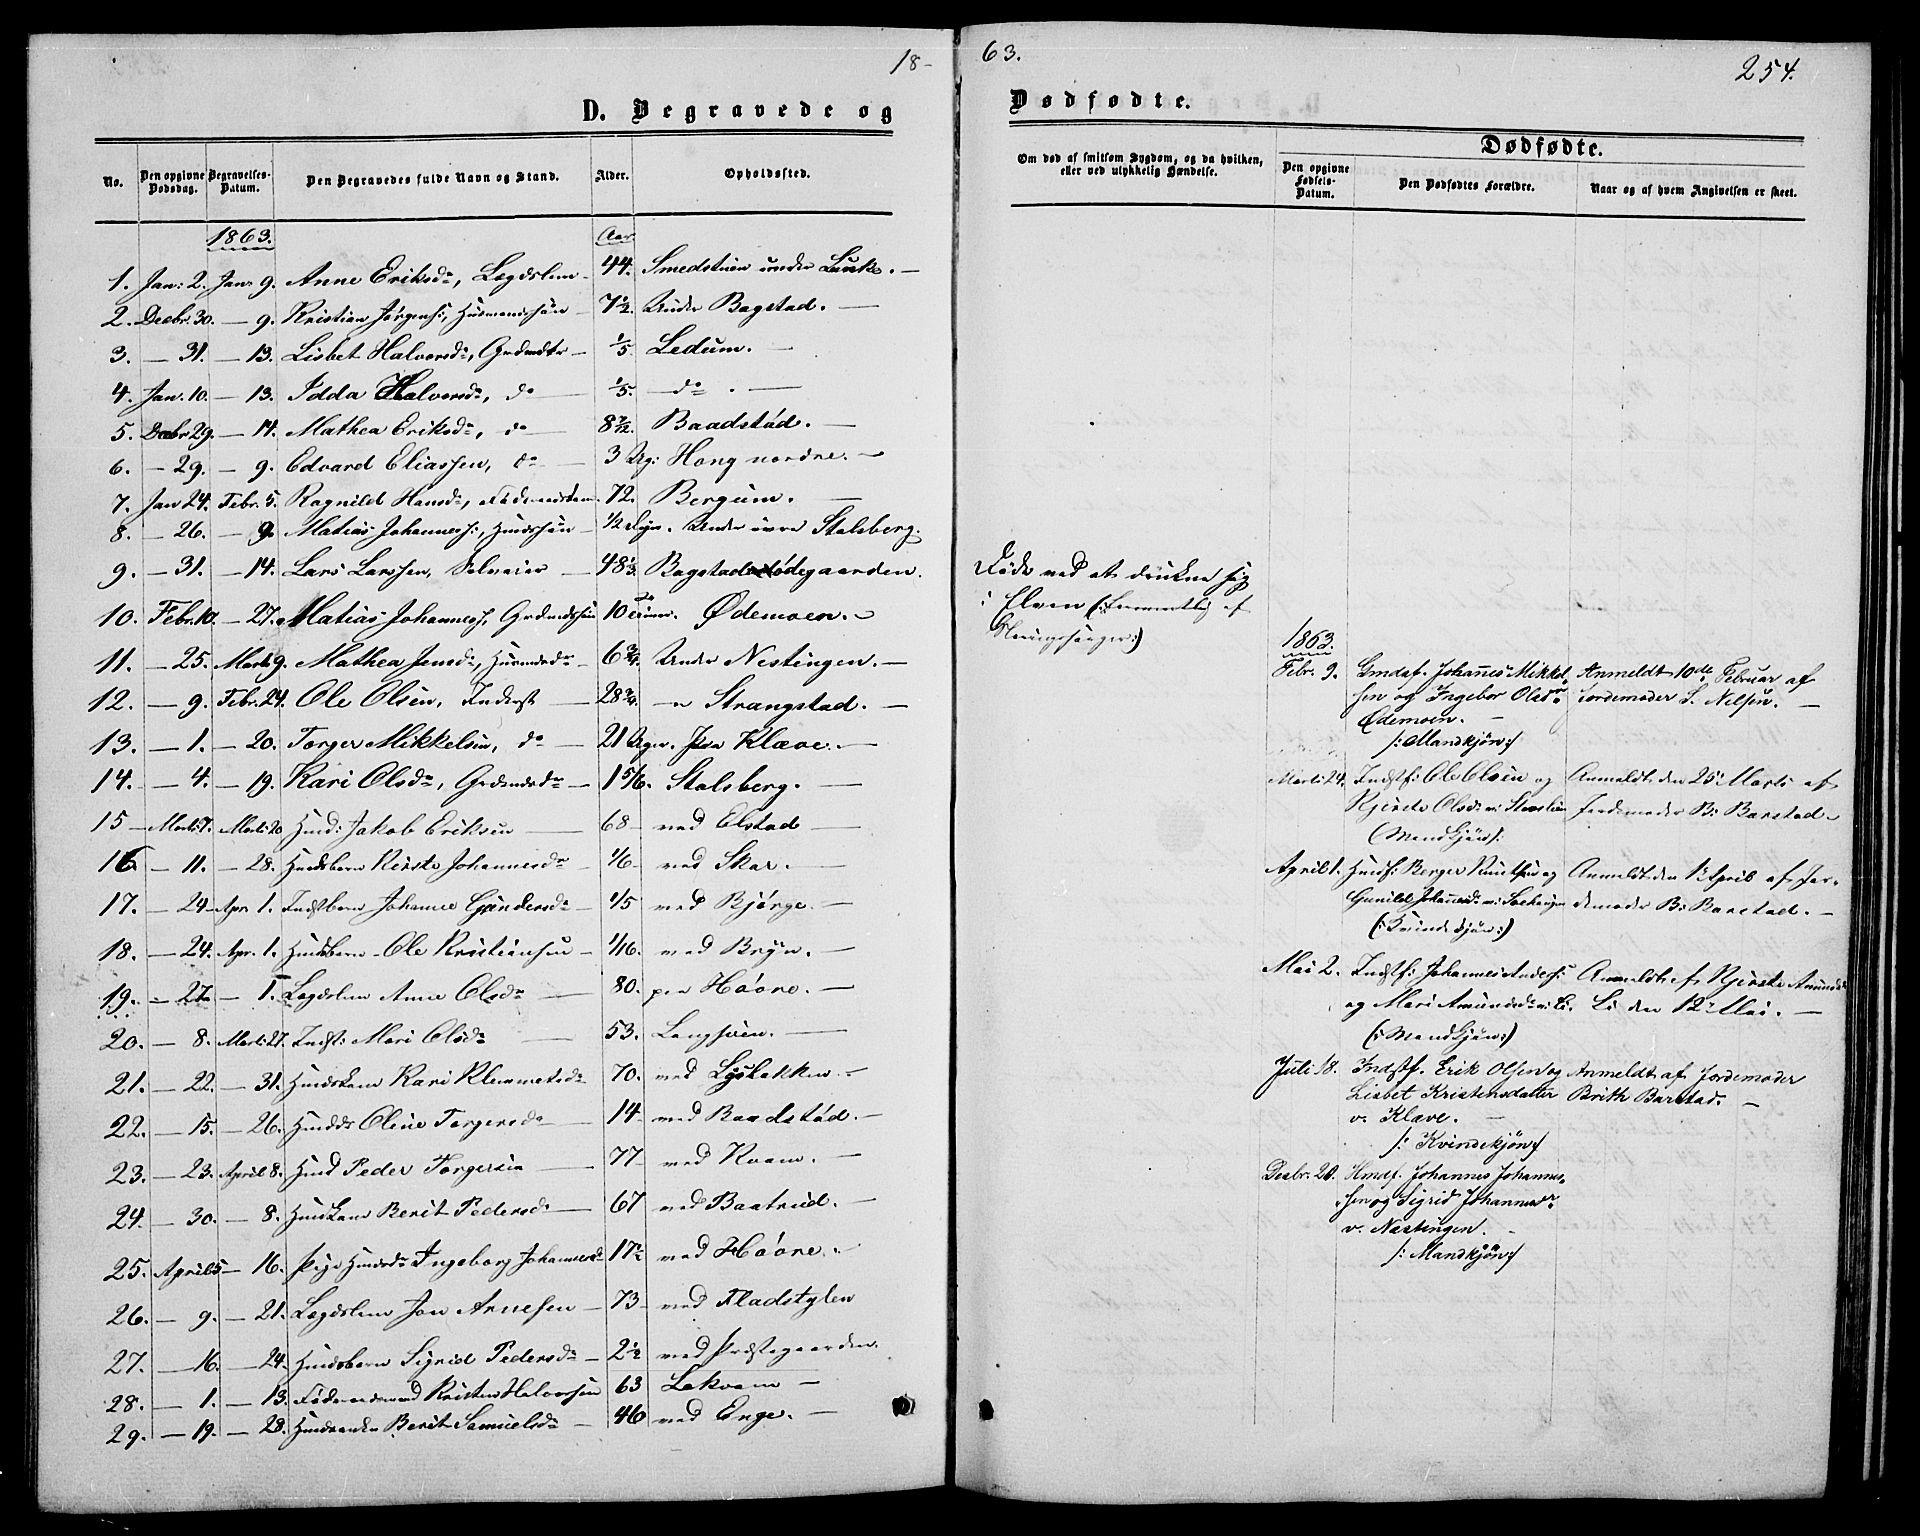 SAH, Øyer prestekontor, Klokkerbok nr. 1, 1863-1877, s. 254